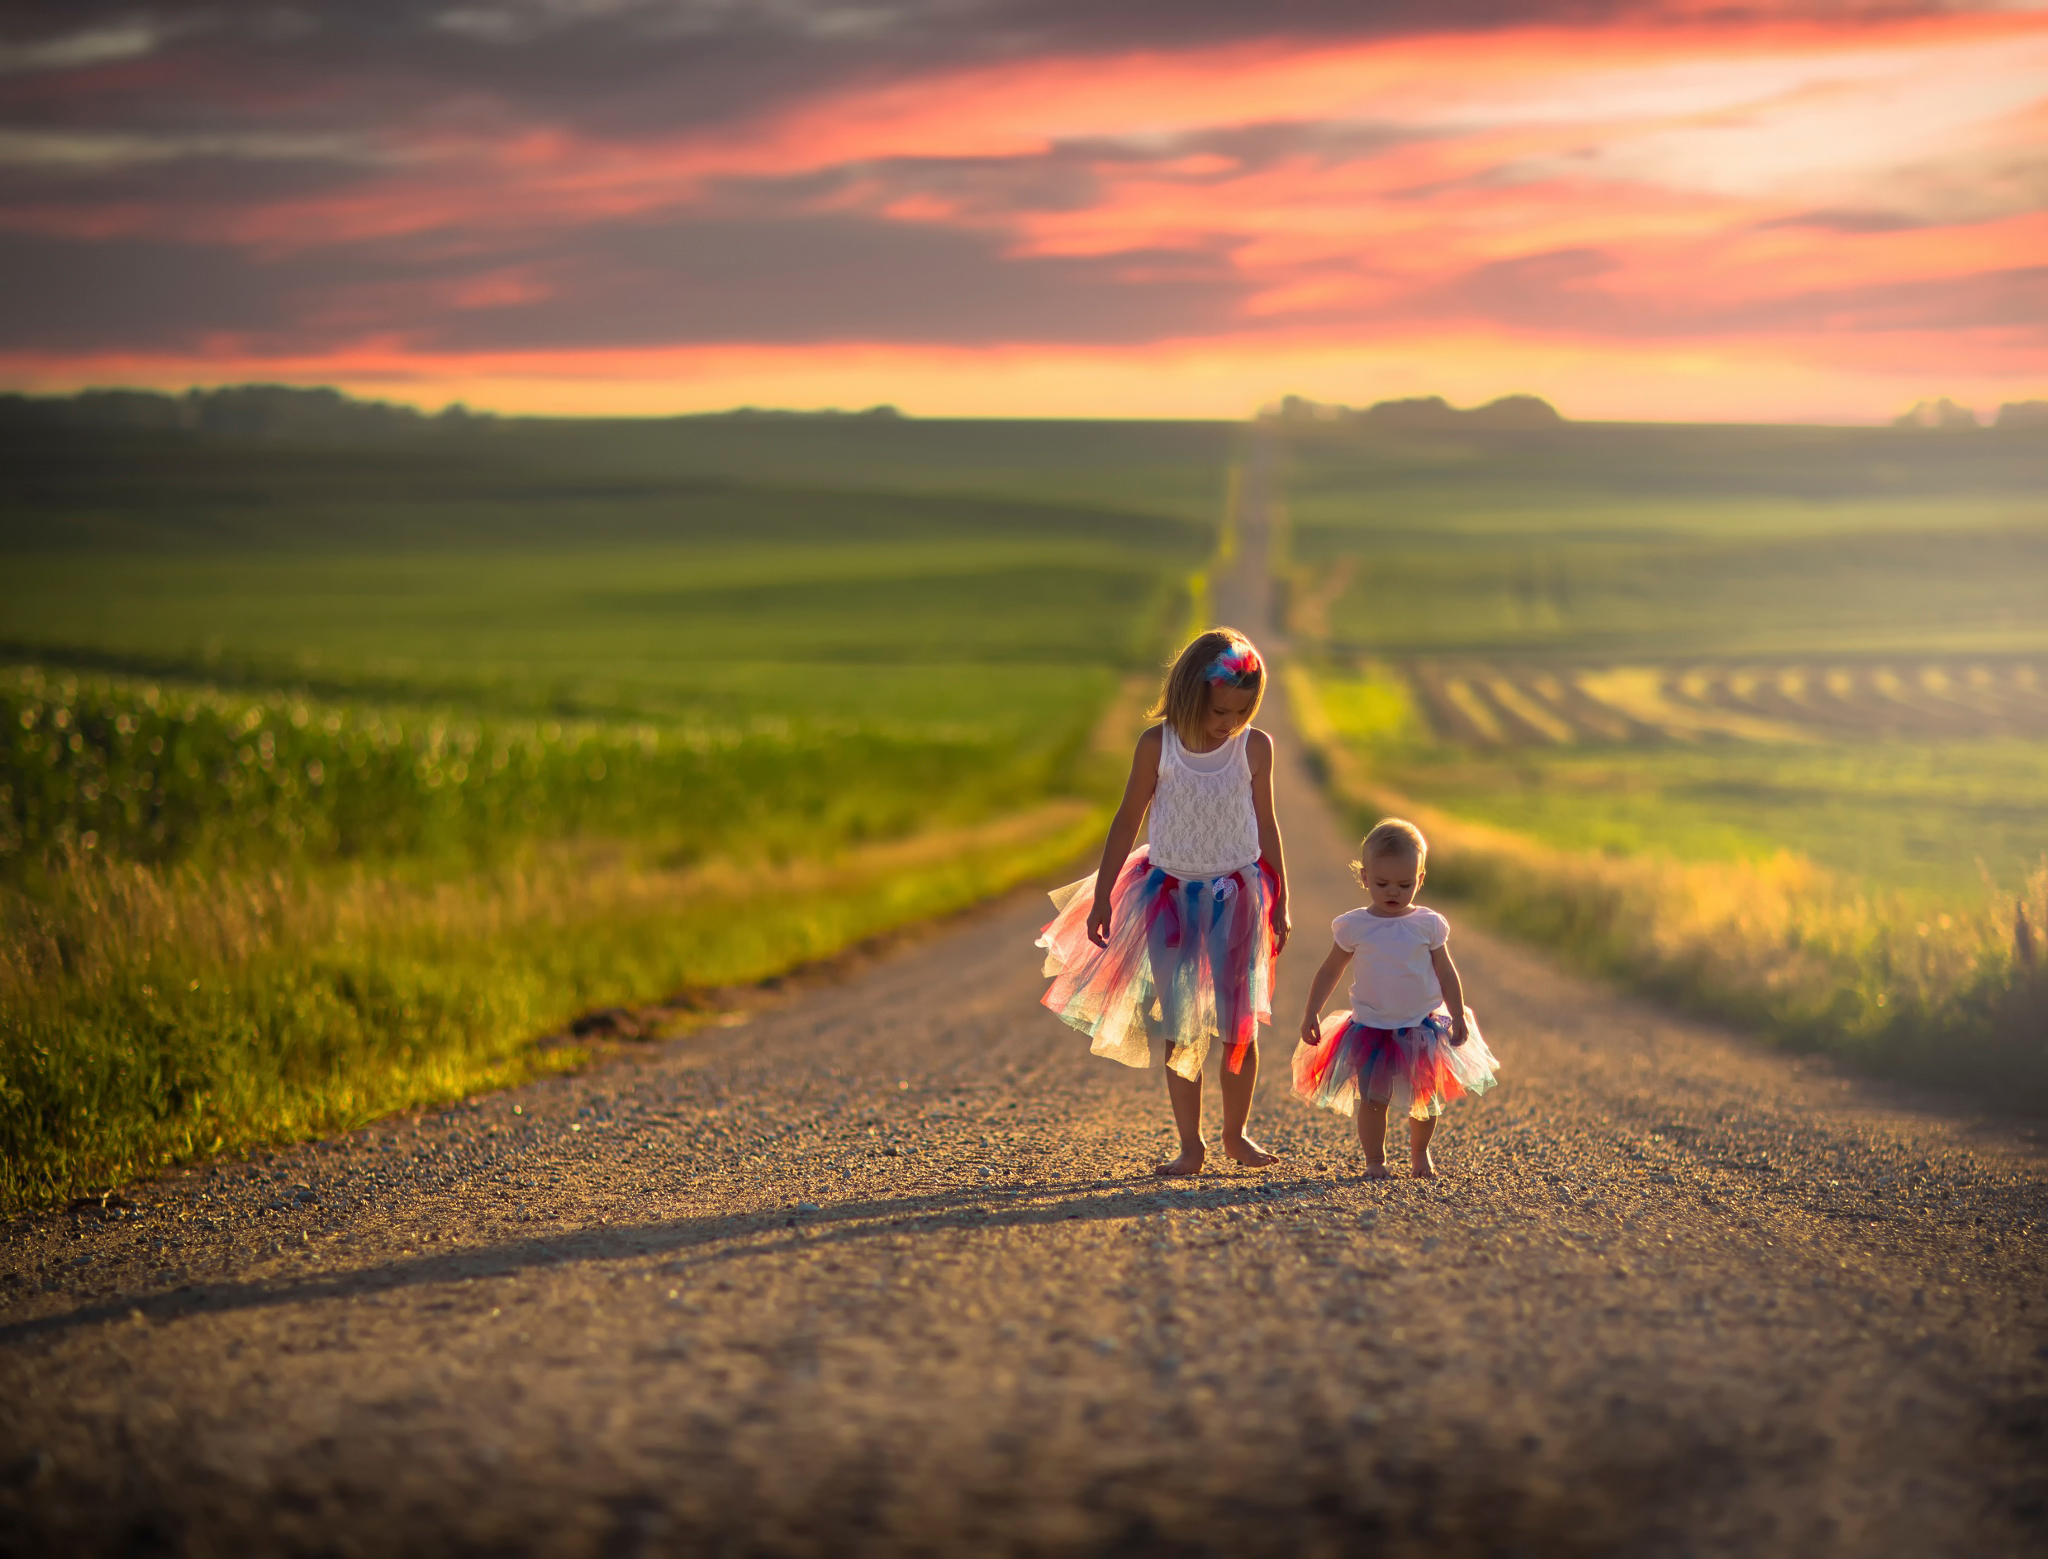 Дорога в детство картинки